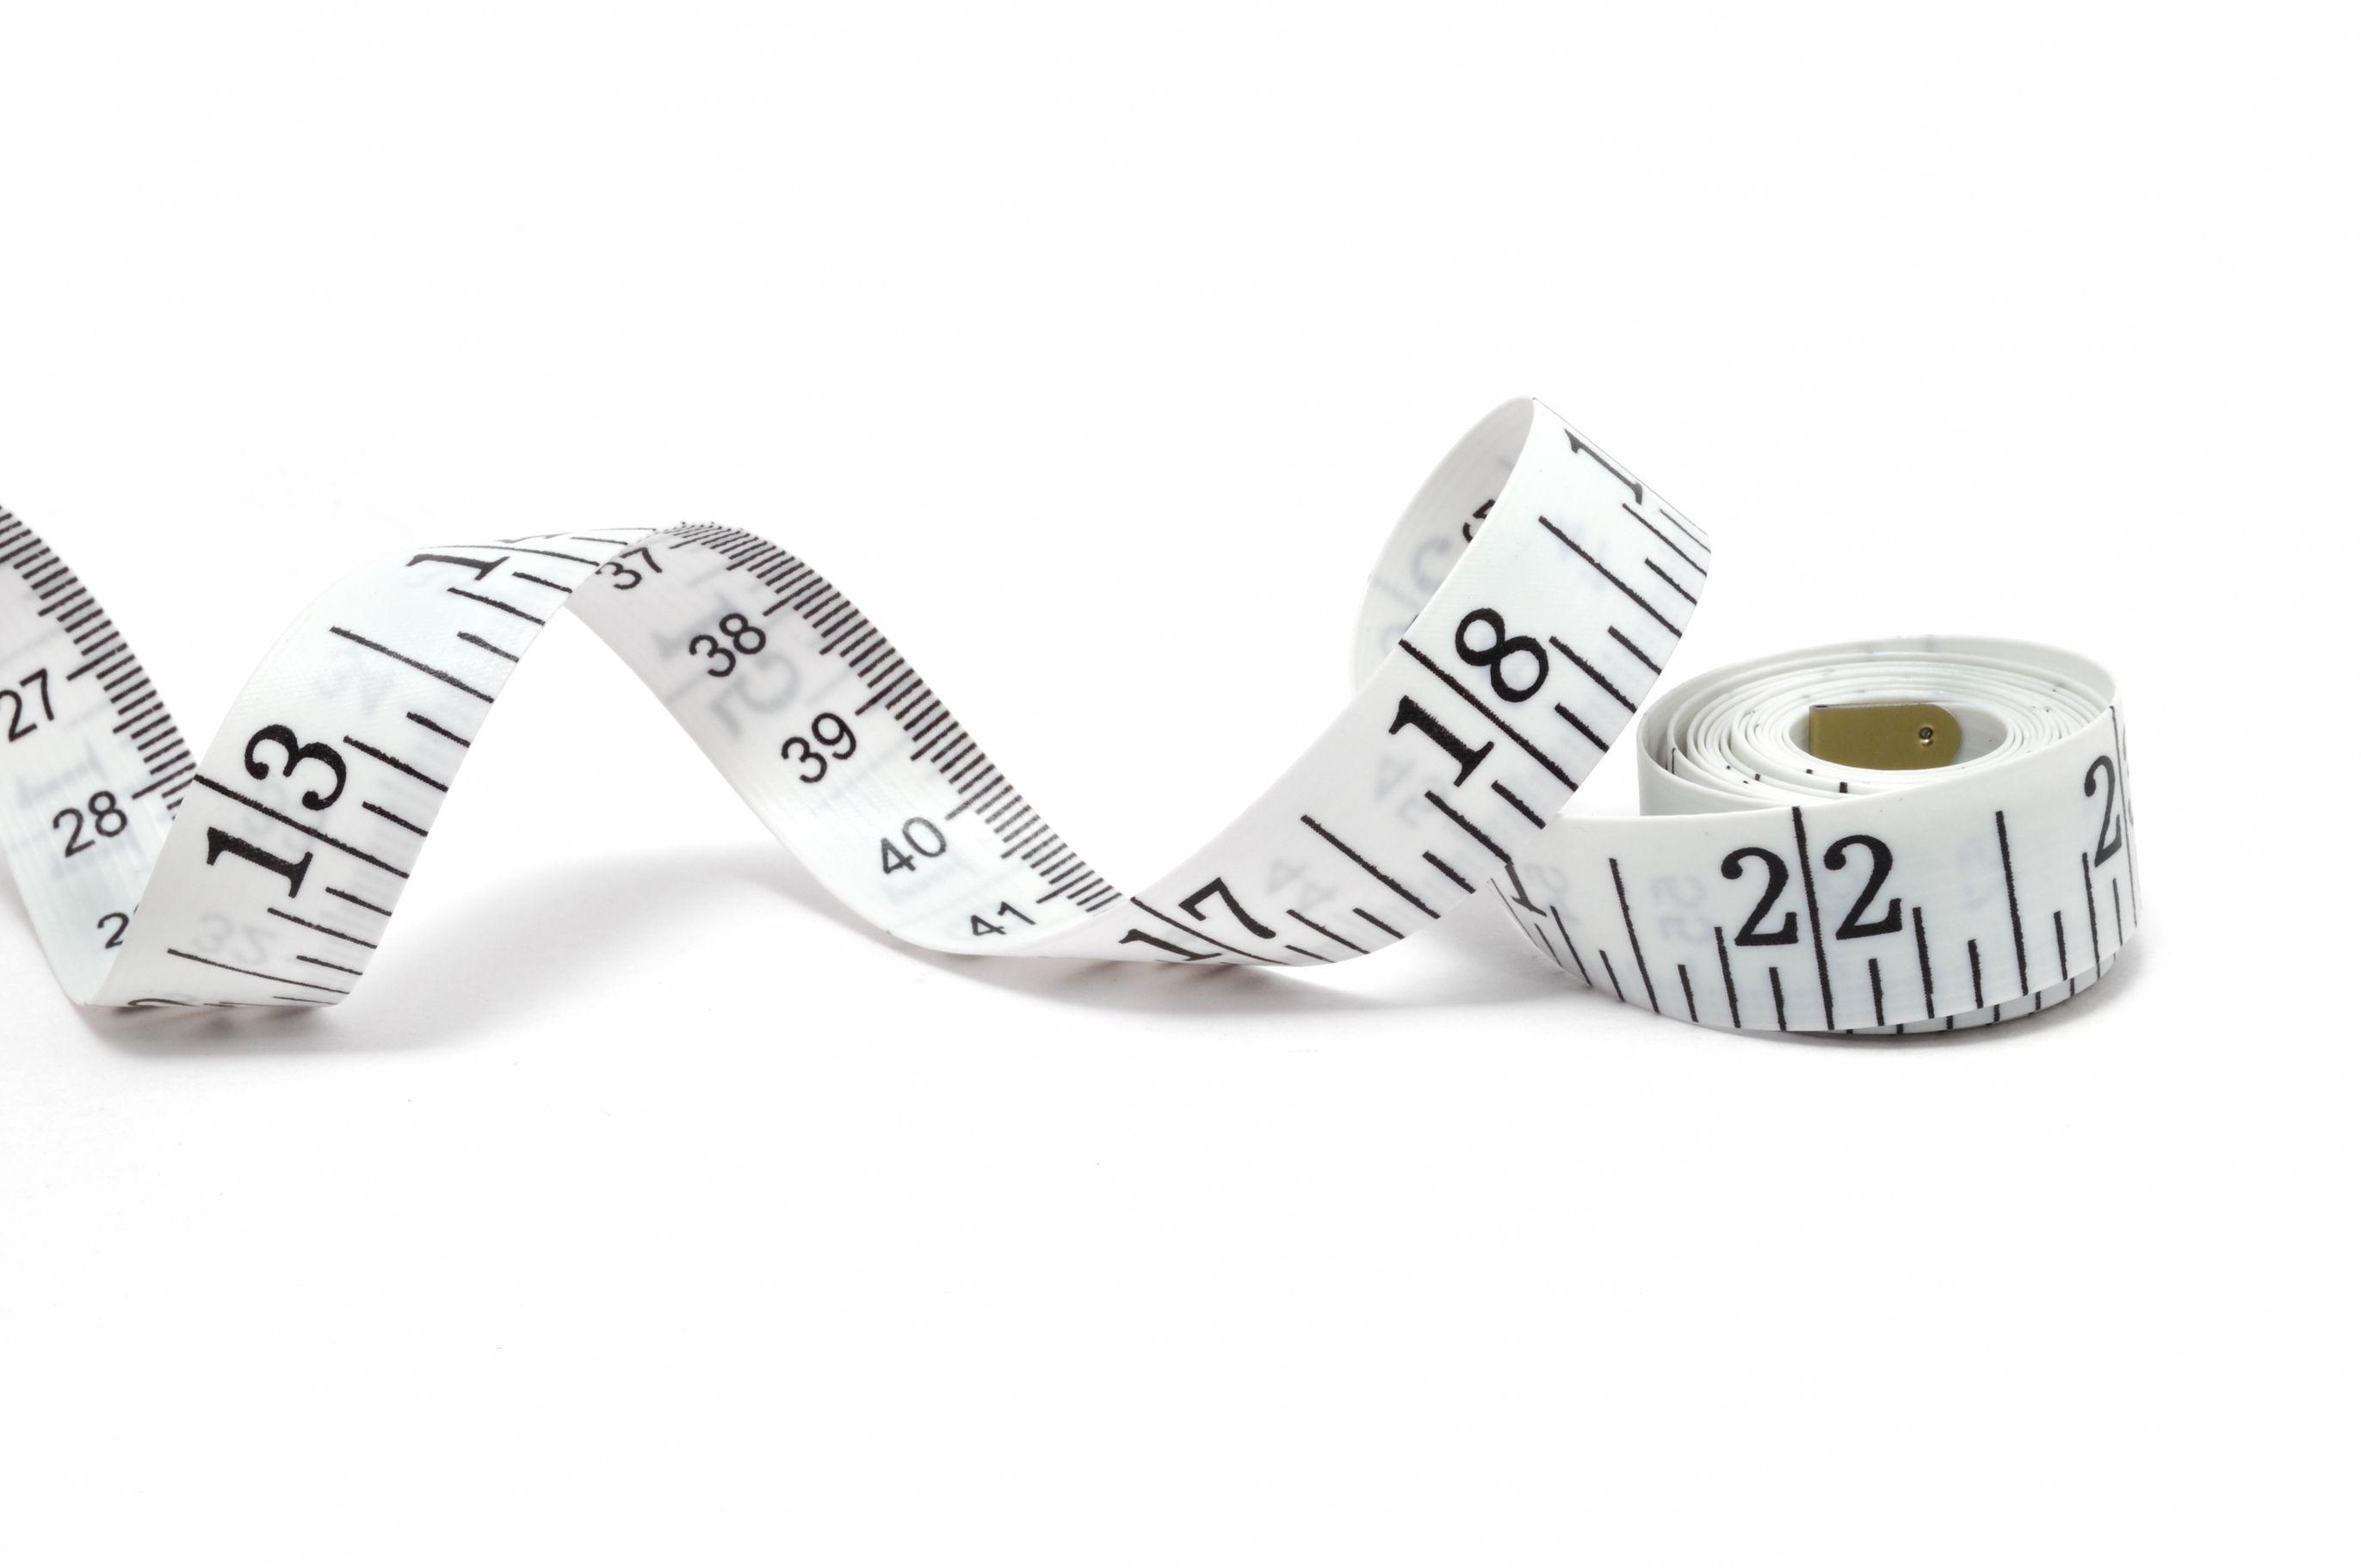 Tape Measure Jpg 2743 1822 Beginner Sewing Kit Bra Size Calculator Sewing For Beginners